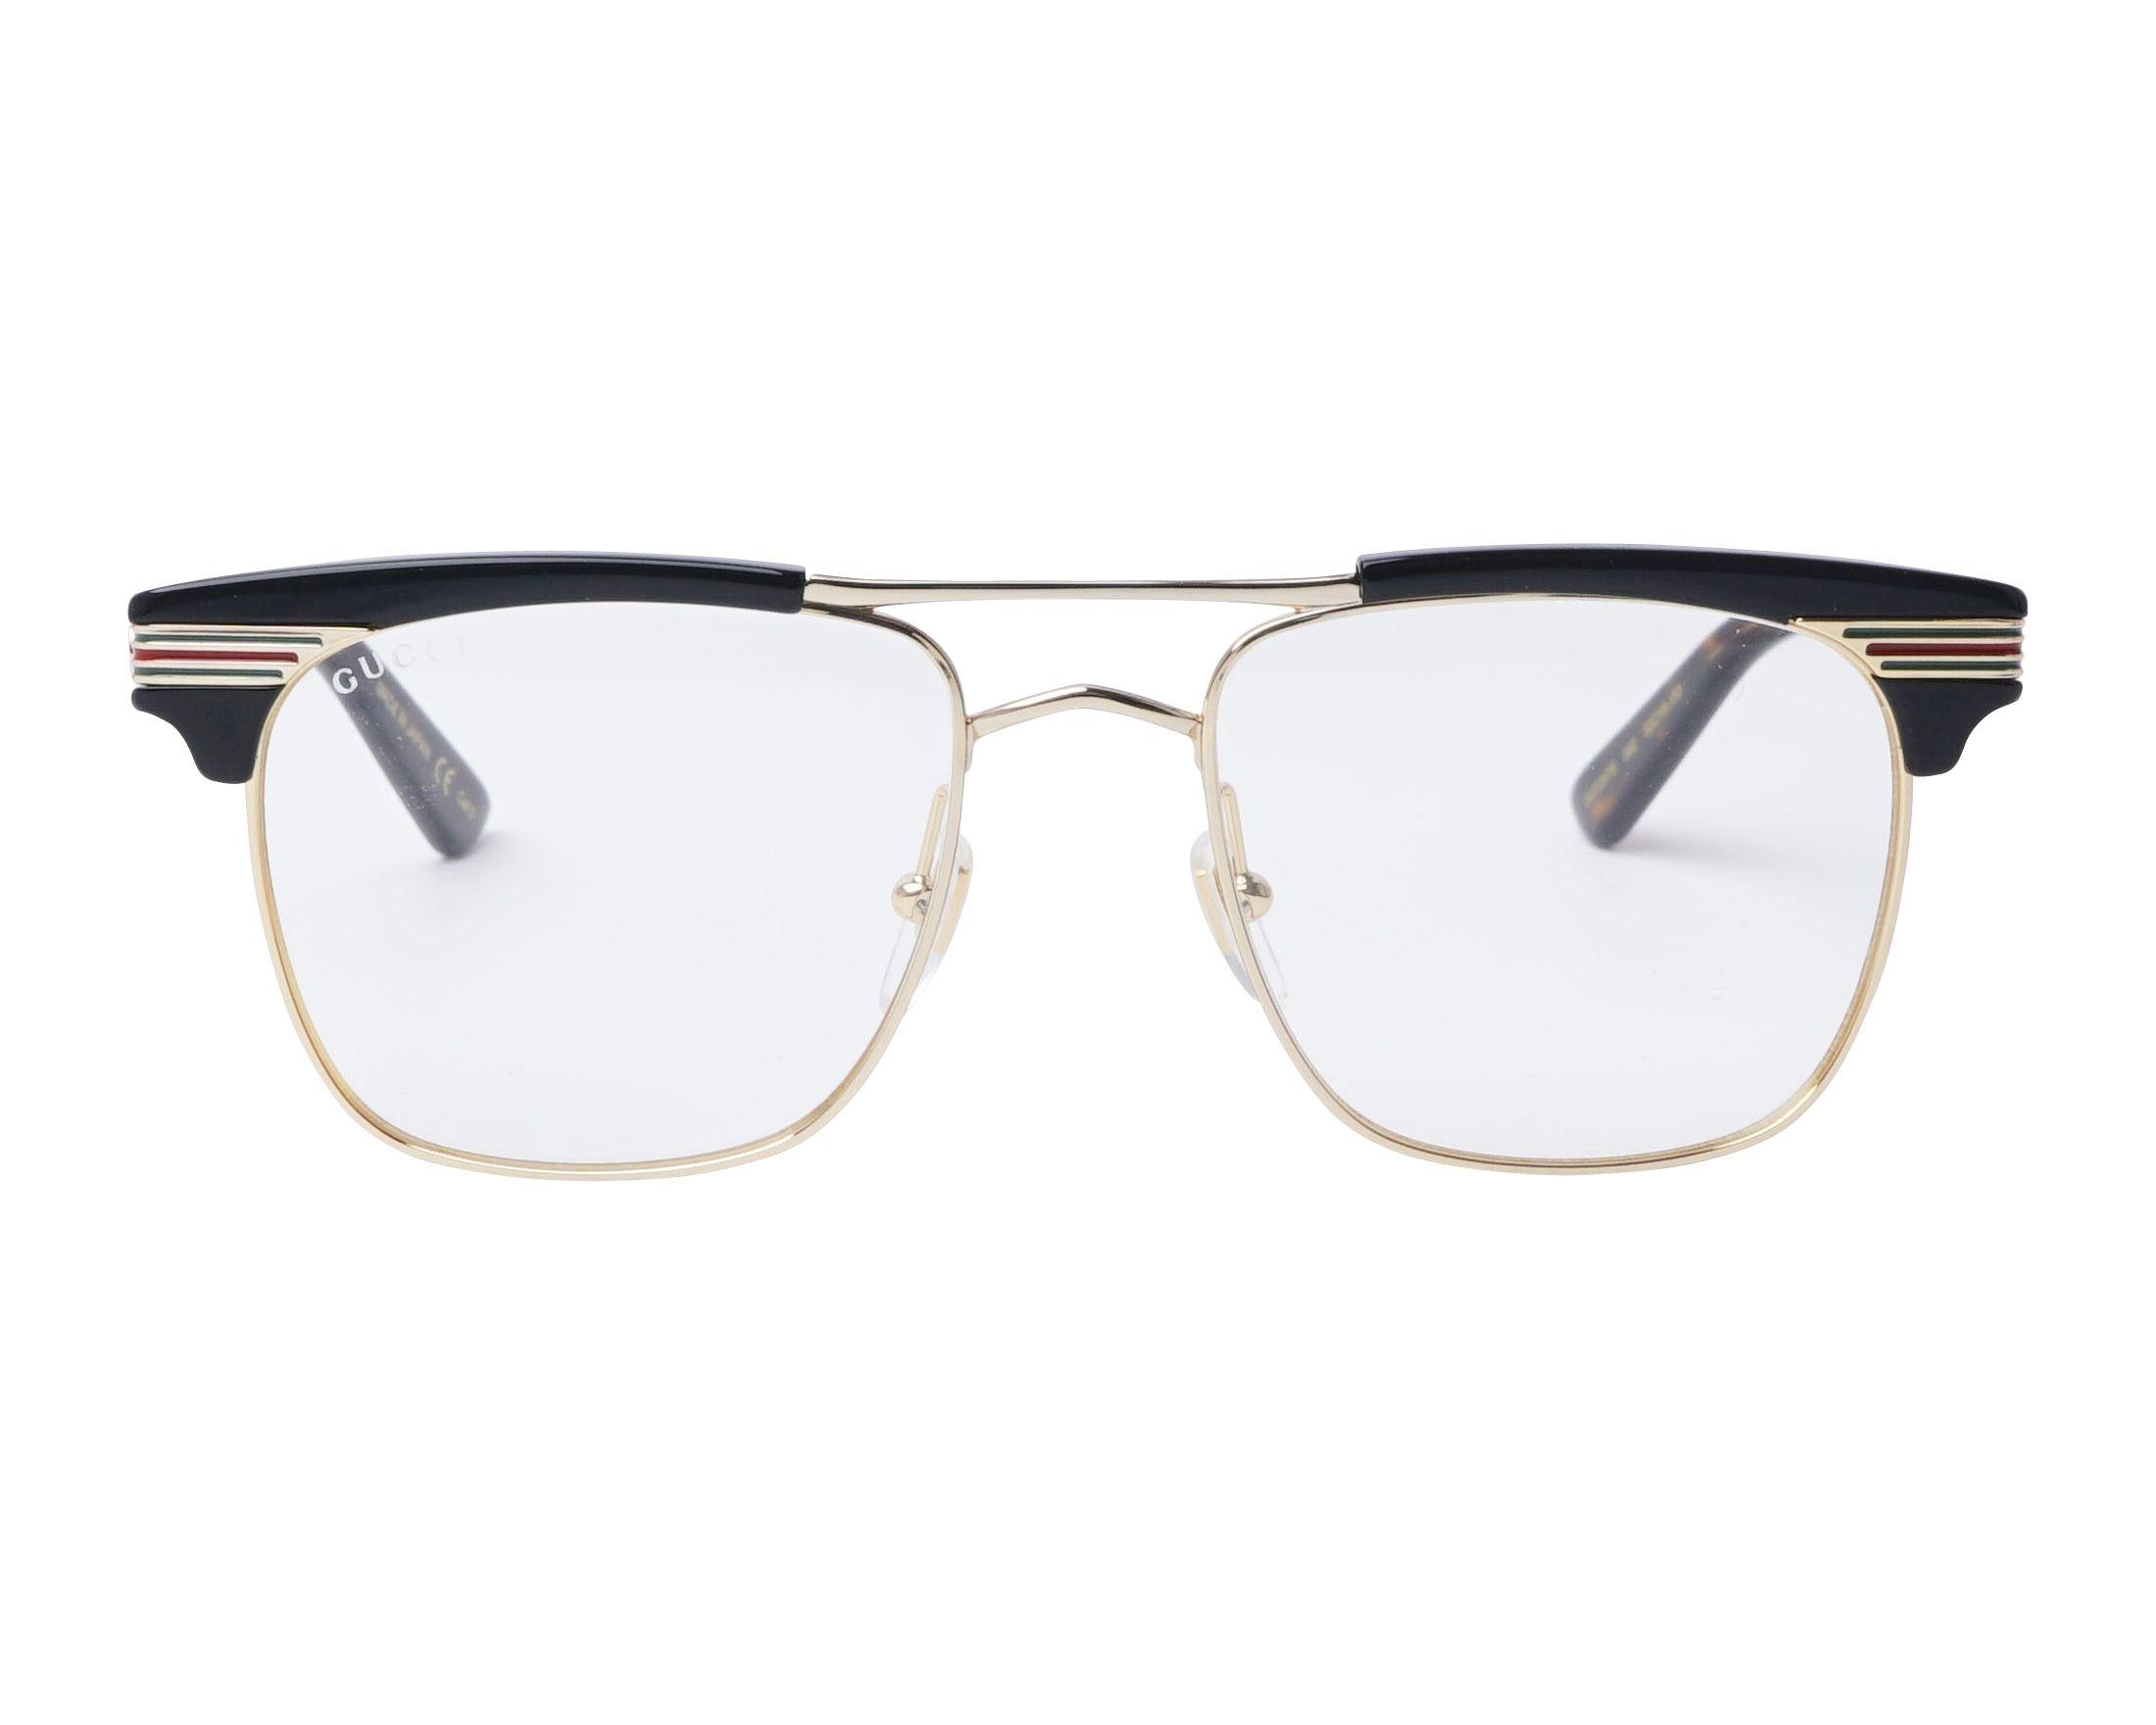 e1eb20ebf44 eyeglasses Gucci GG-0287-S 002 52-18 Gold Black front view